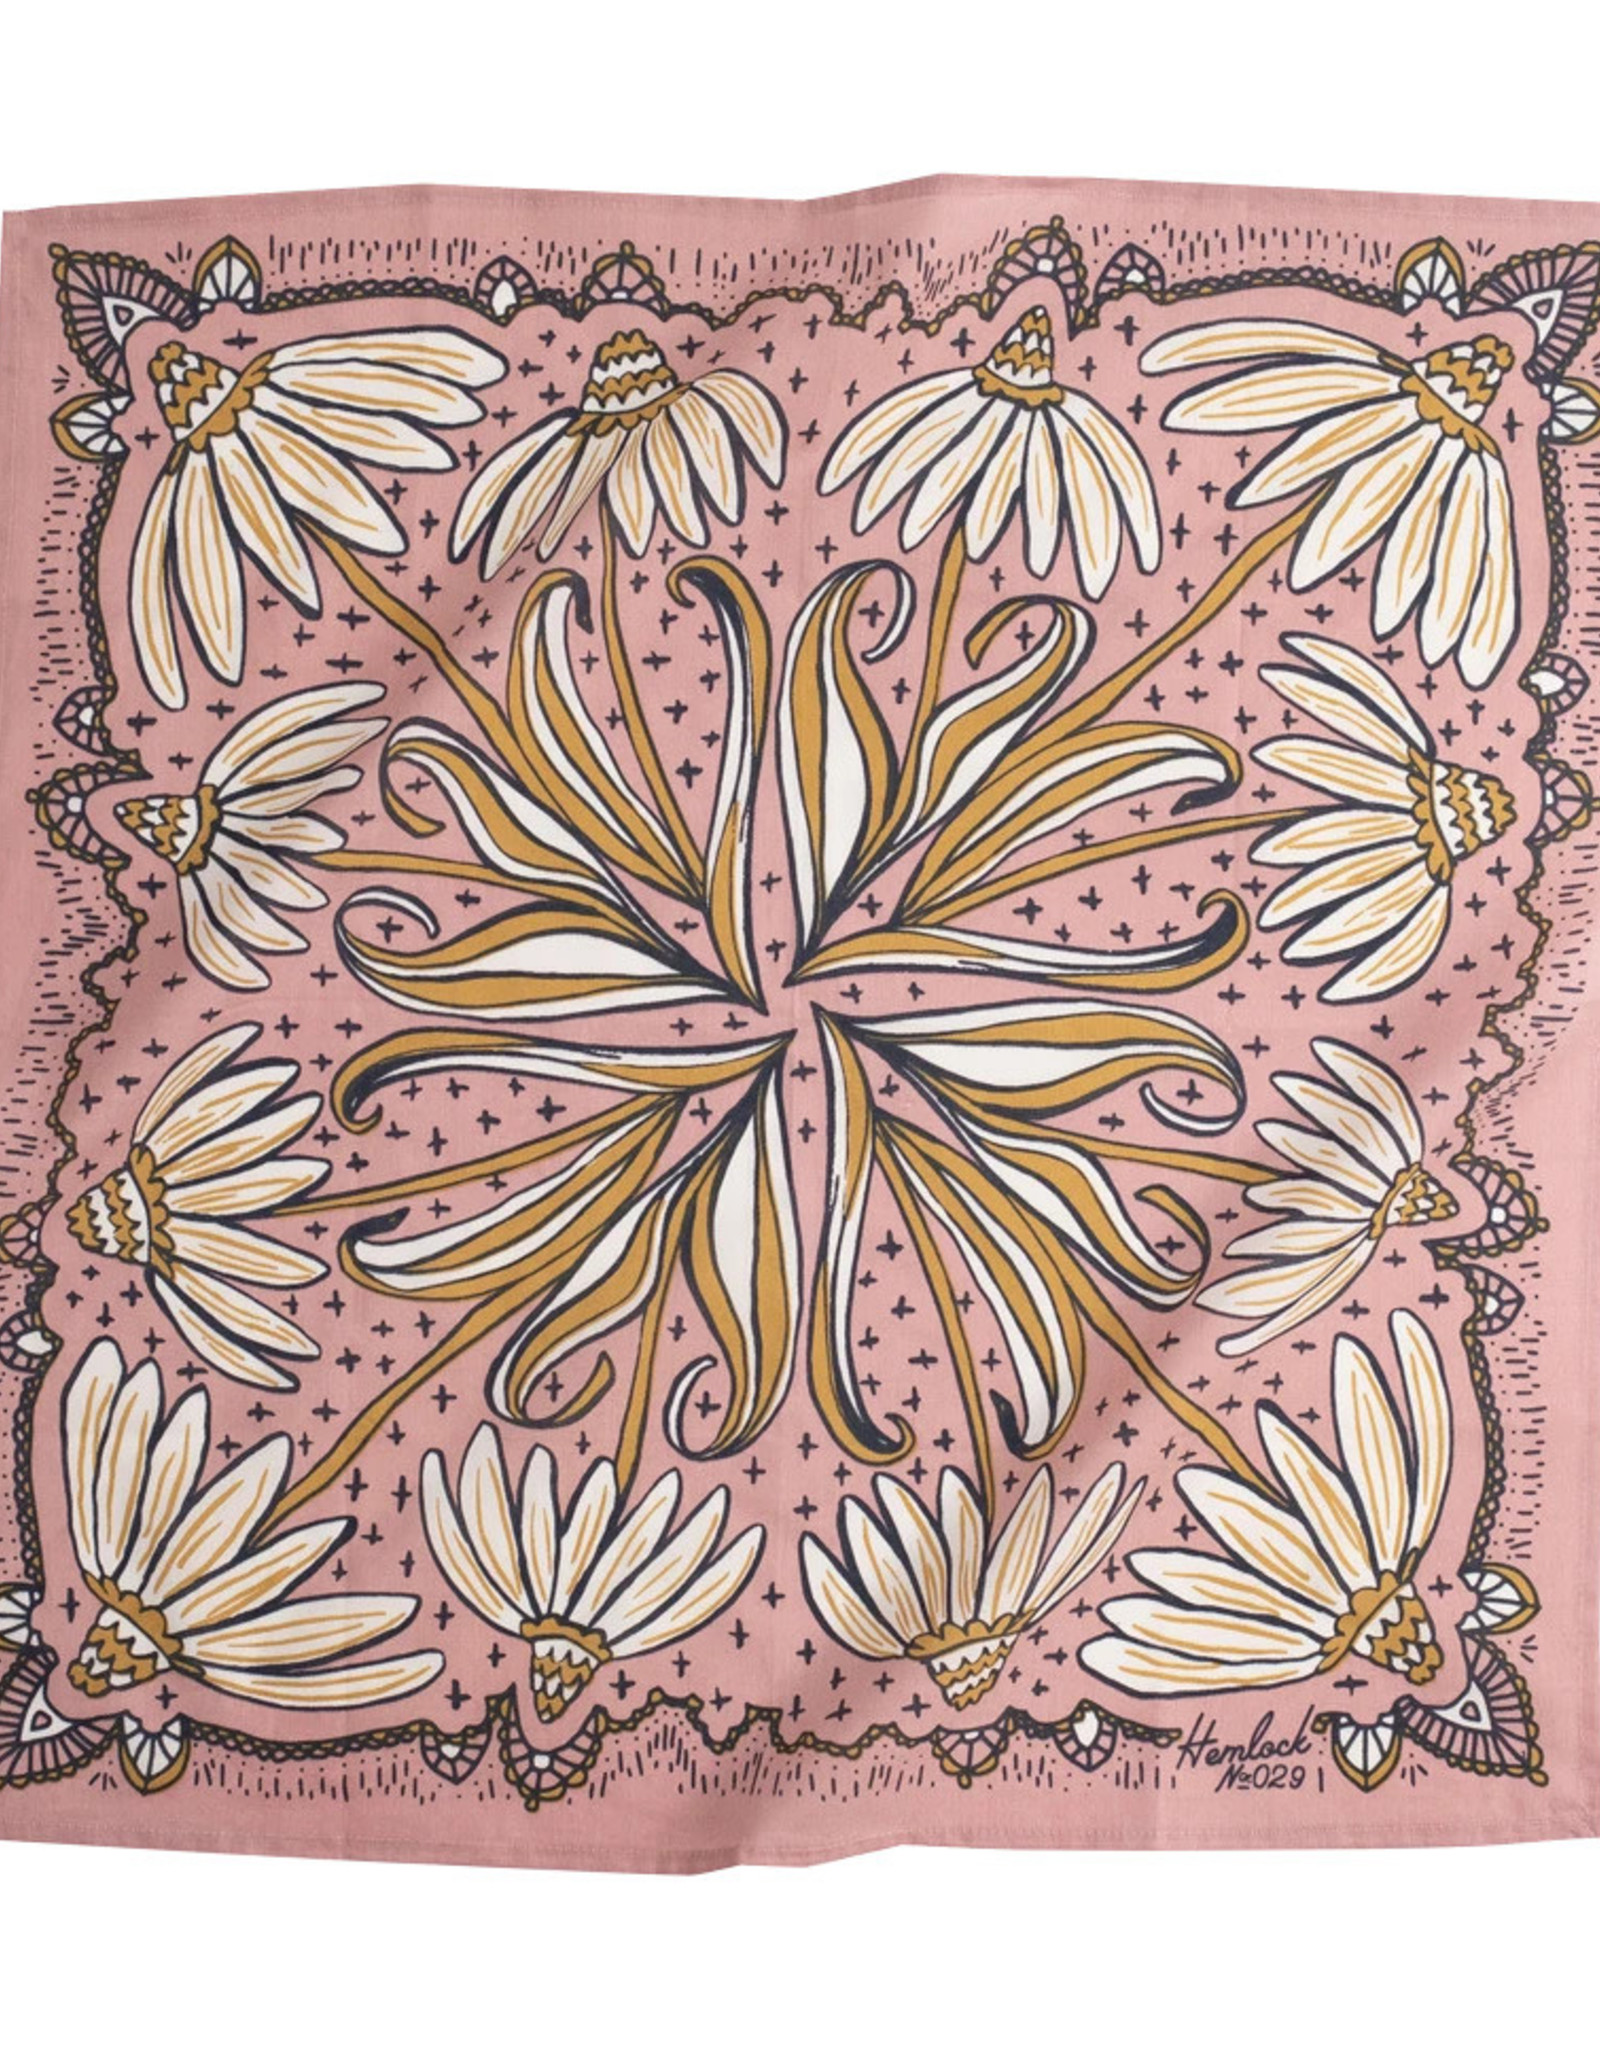 Hemlock Hemlock - Bandana - Maude